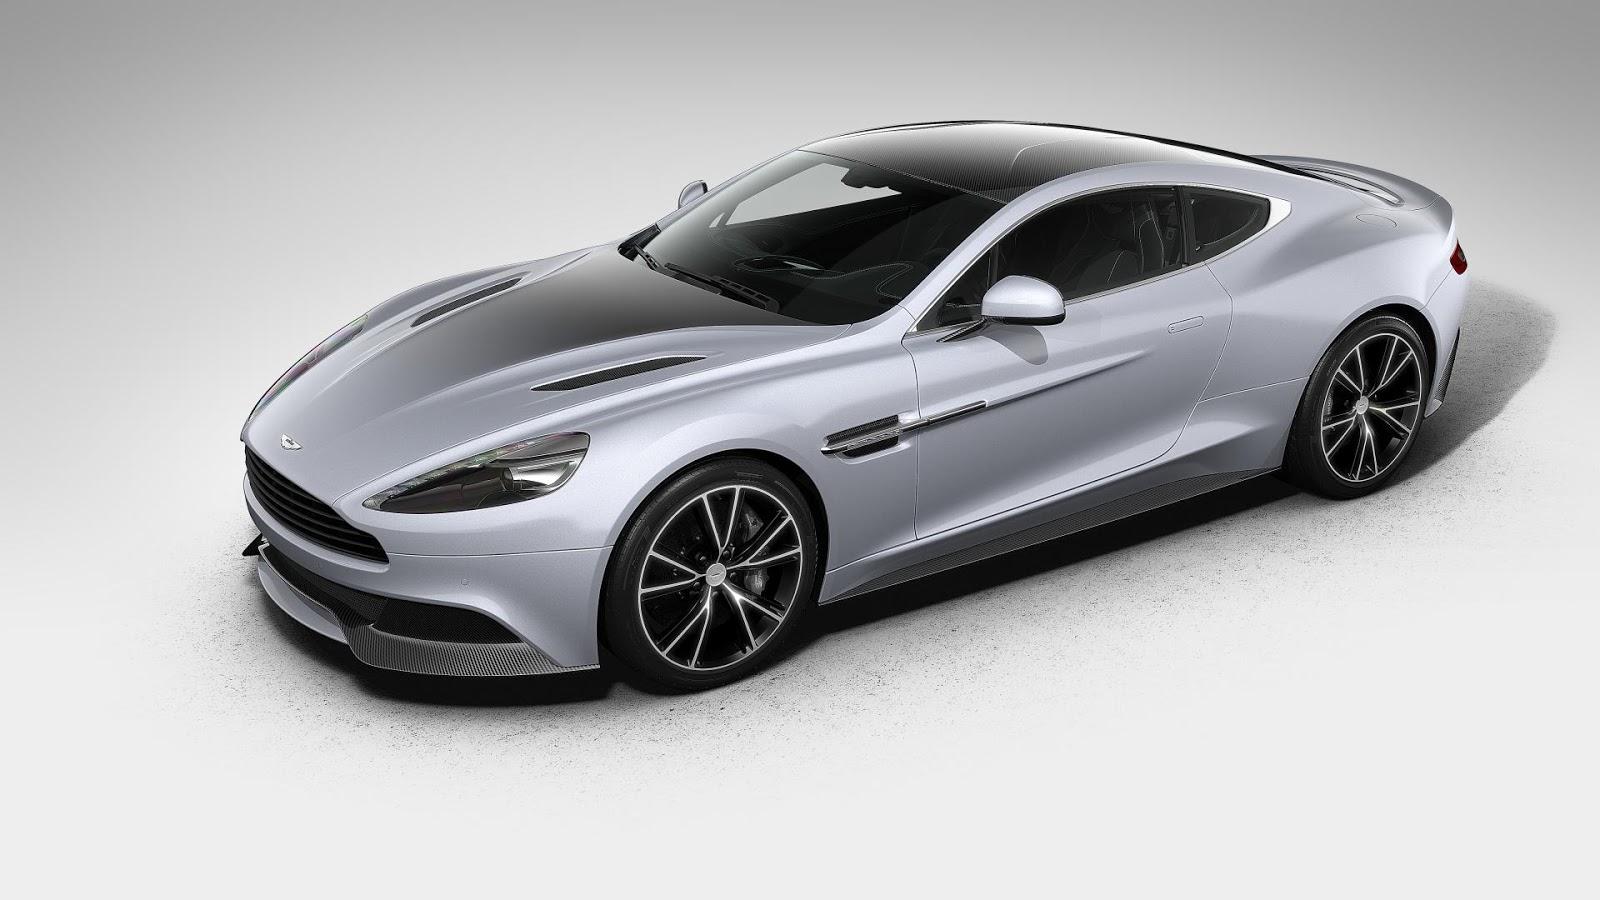 Aston Martin Vanquish Centenary 2013